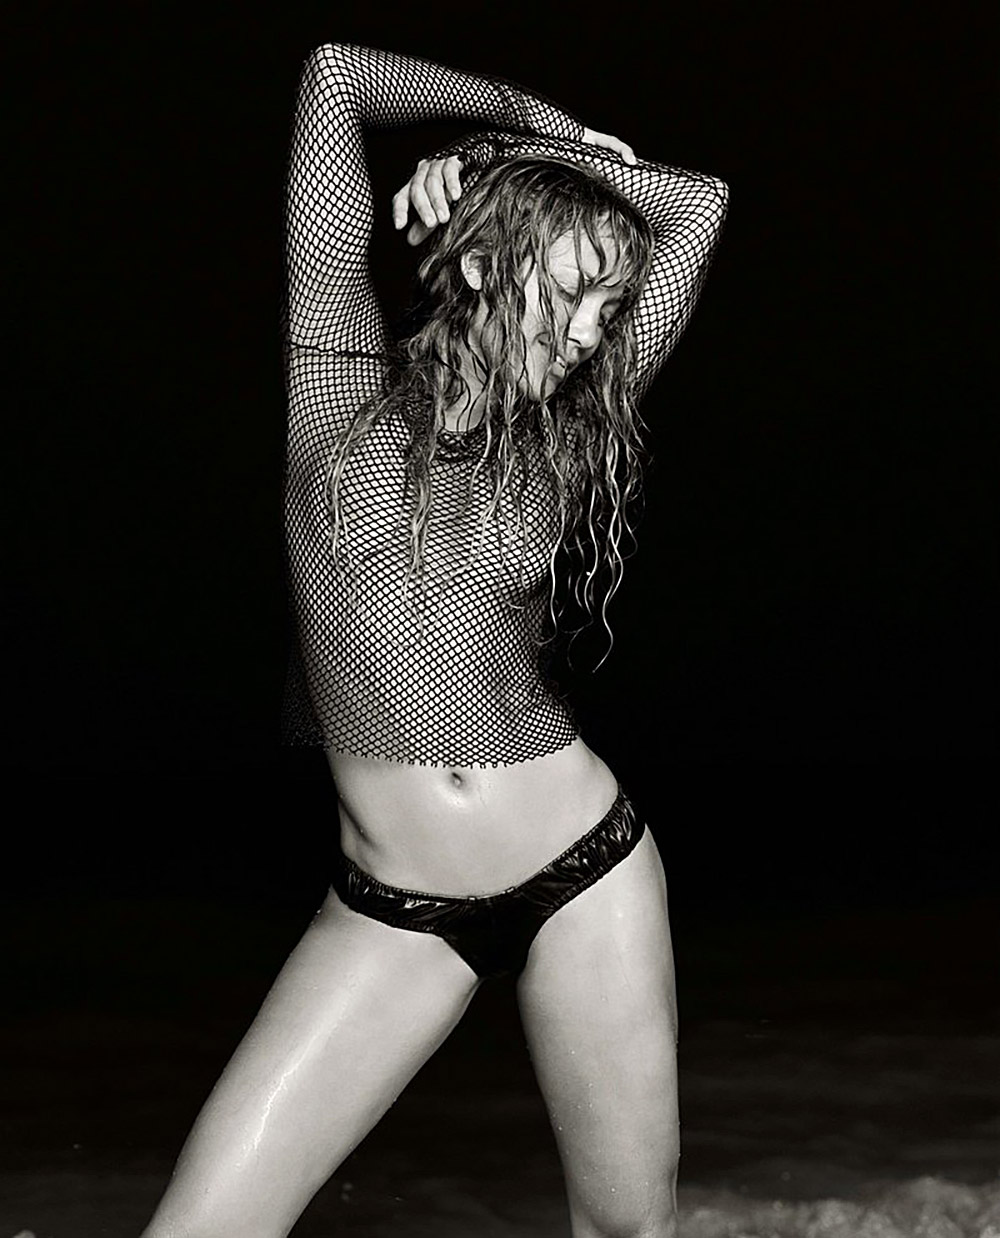 Sexiest Jennifer Lopez Nude Pictures - Scandalpost-1704